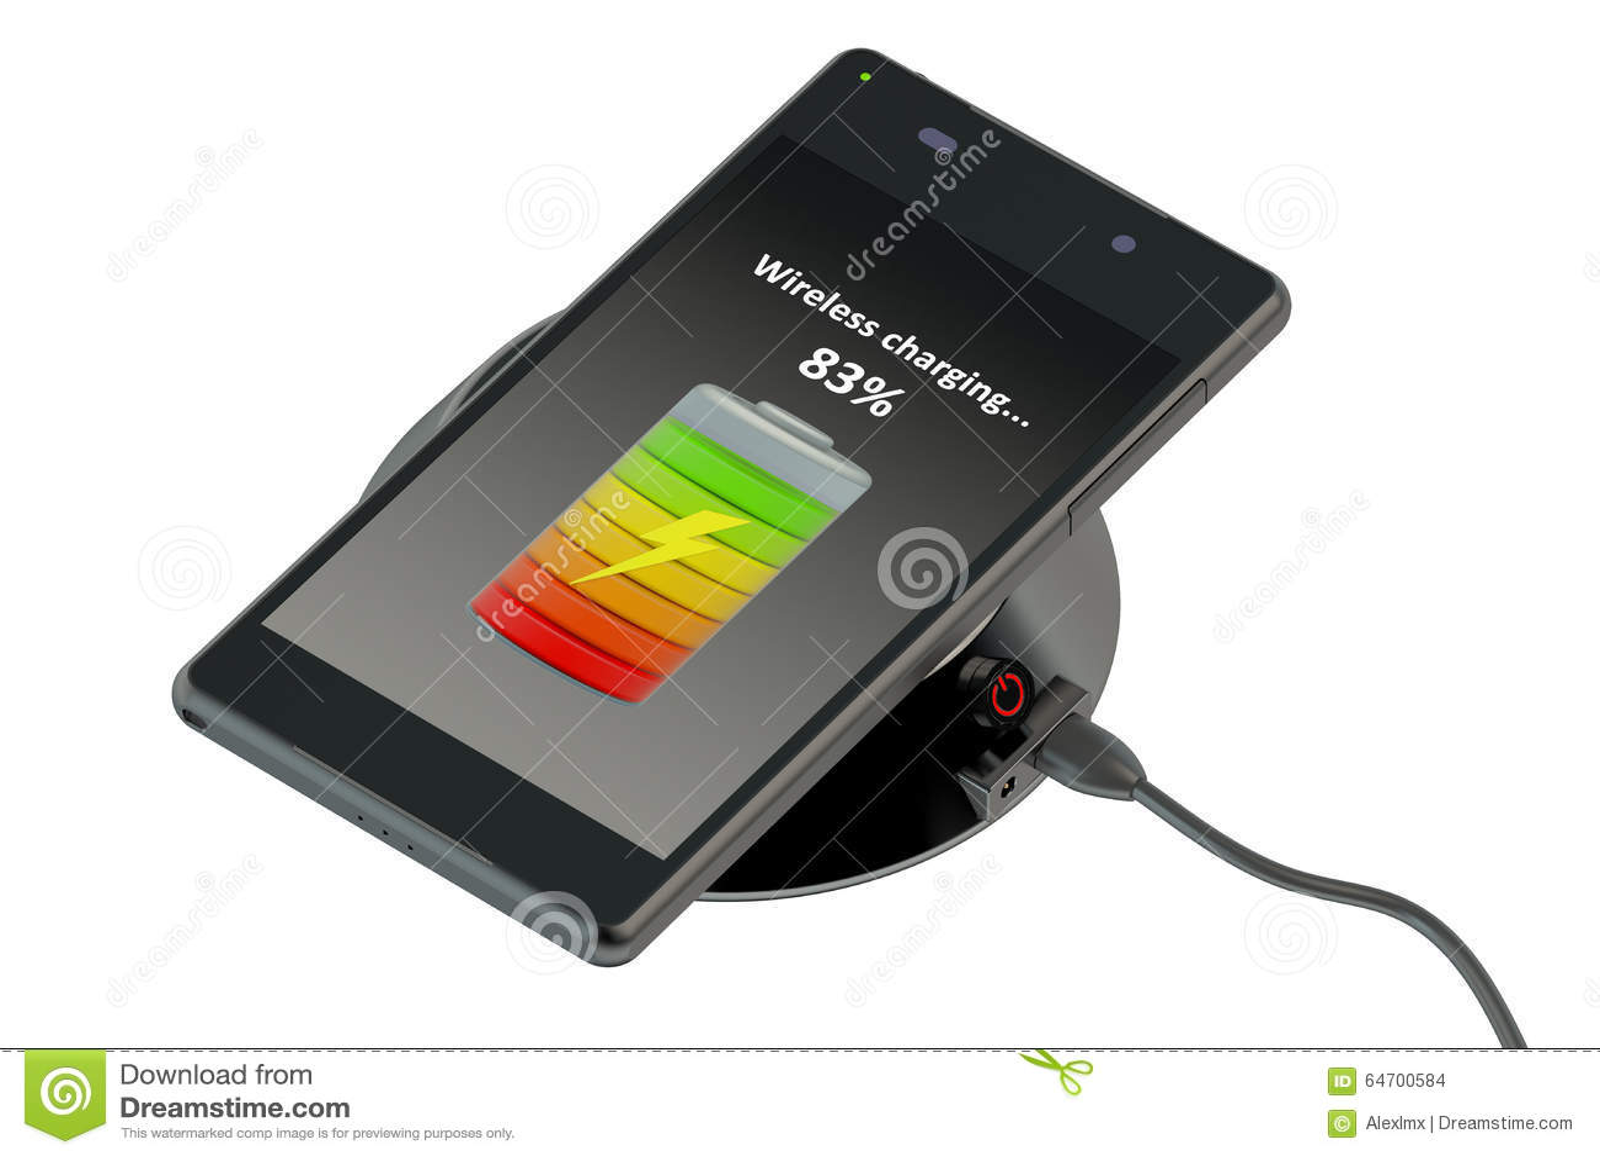 wireless charging of smartphone stock illustration image 64700584. Black Bedroom Furniture Sets. Home Design Ideas